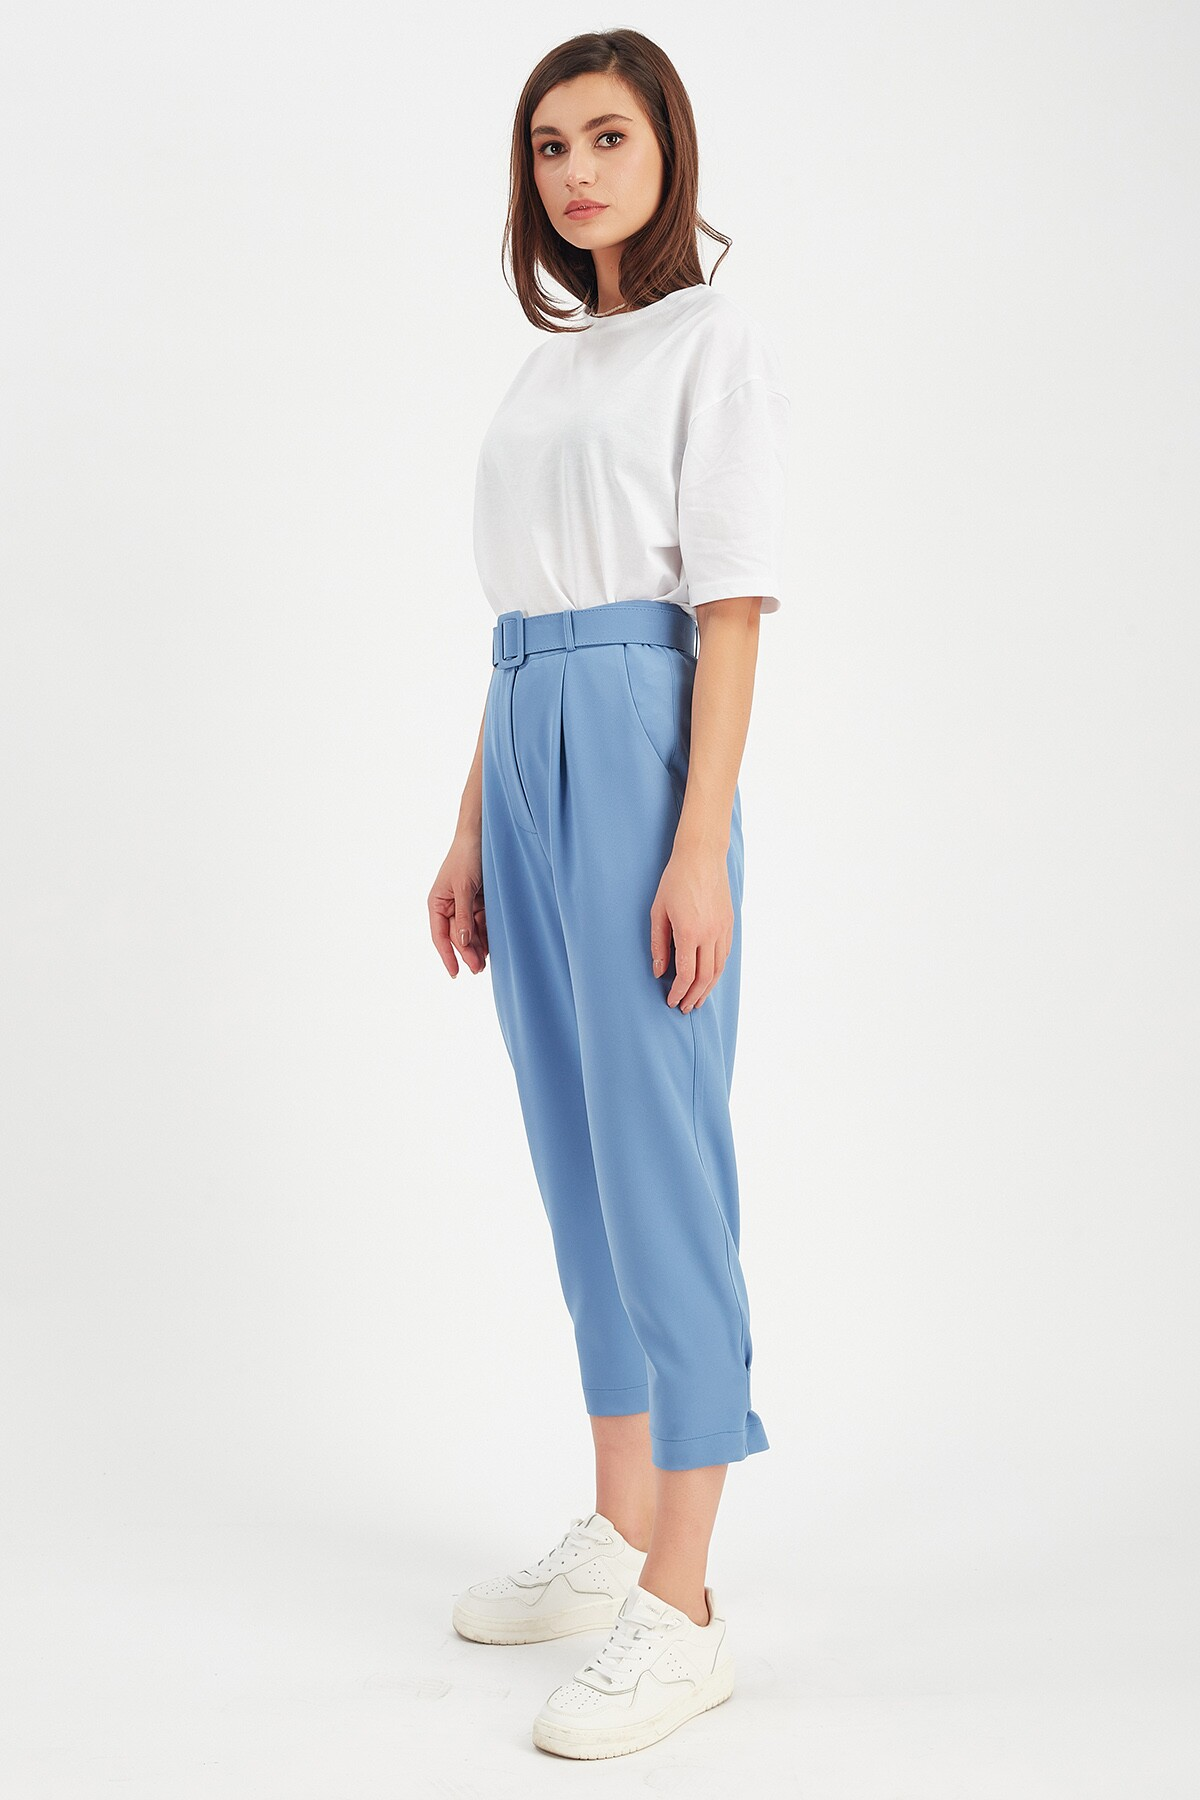 Mavi Düğme Detaylı Pantolon | Mk21W660128